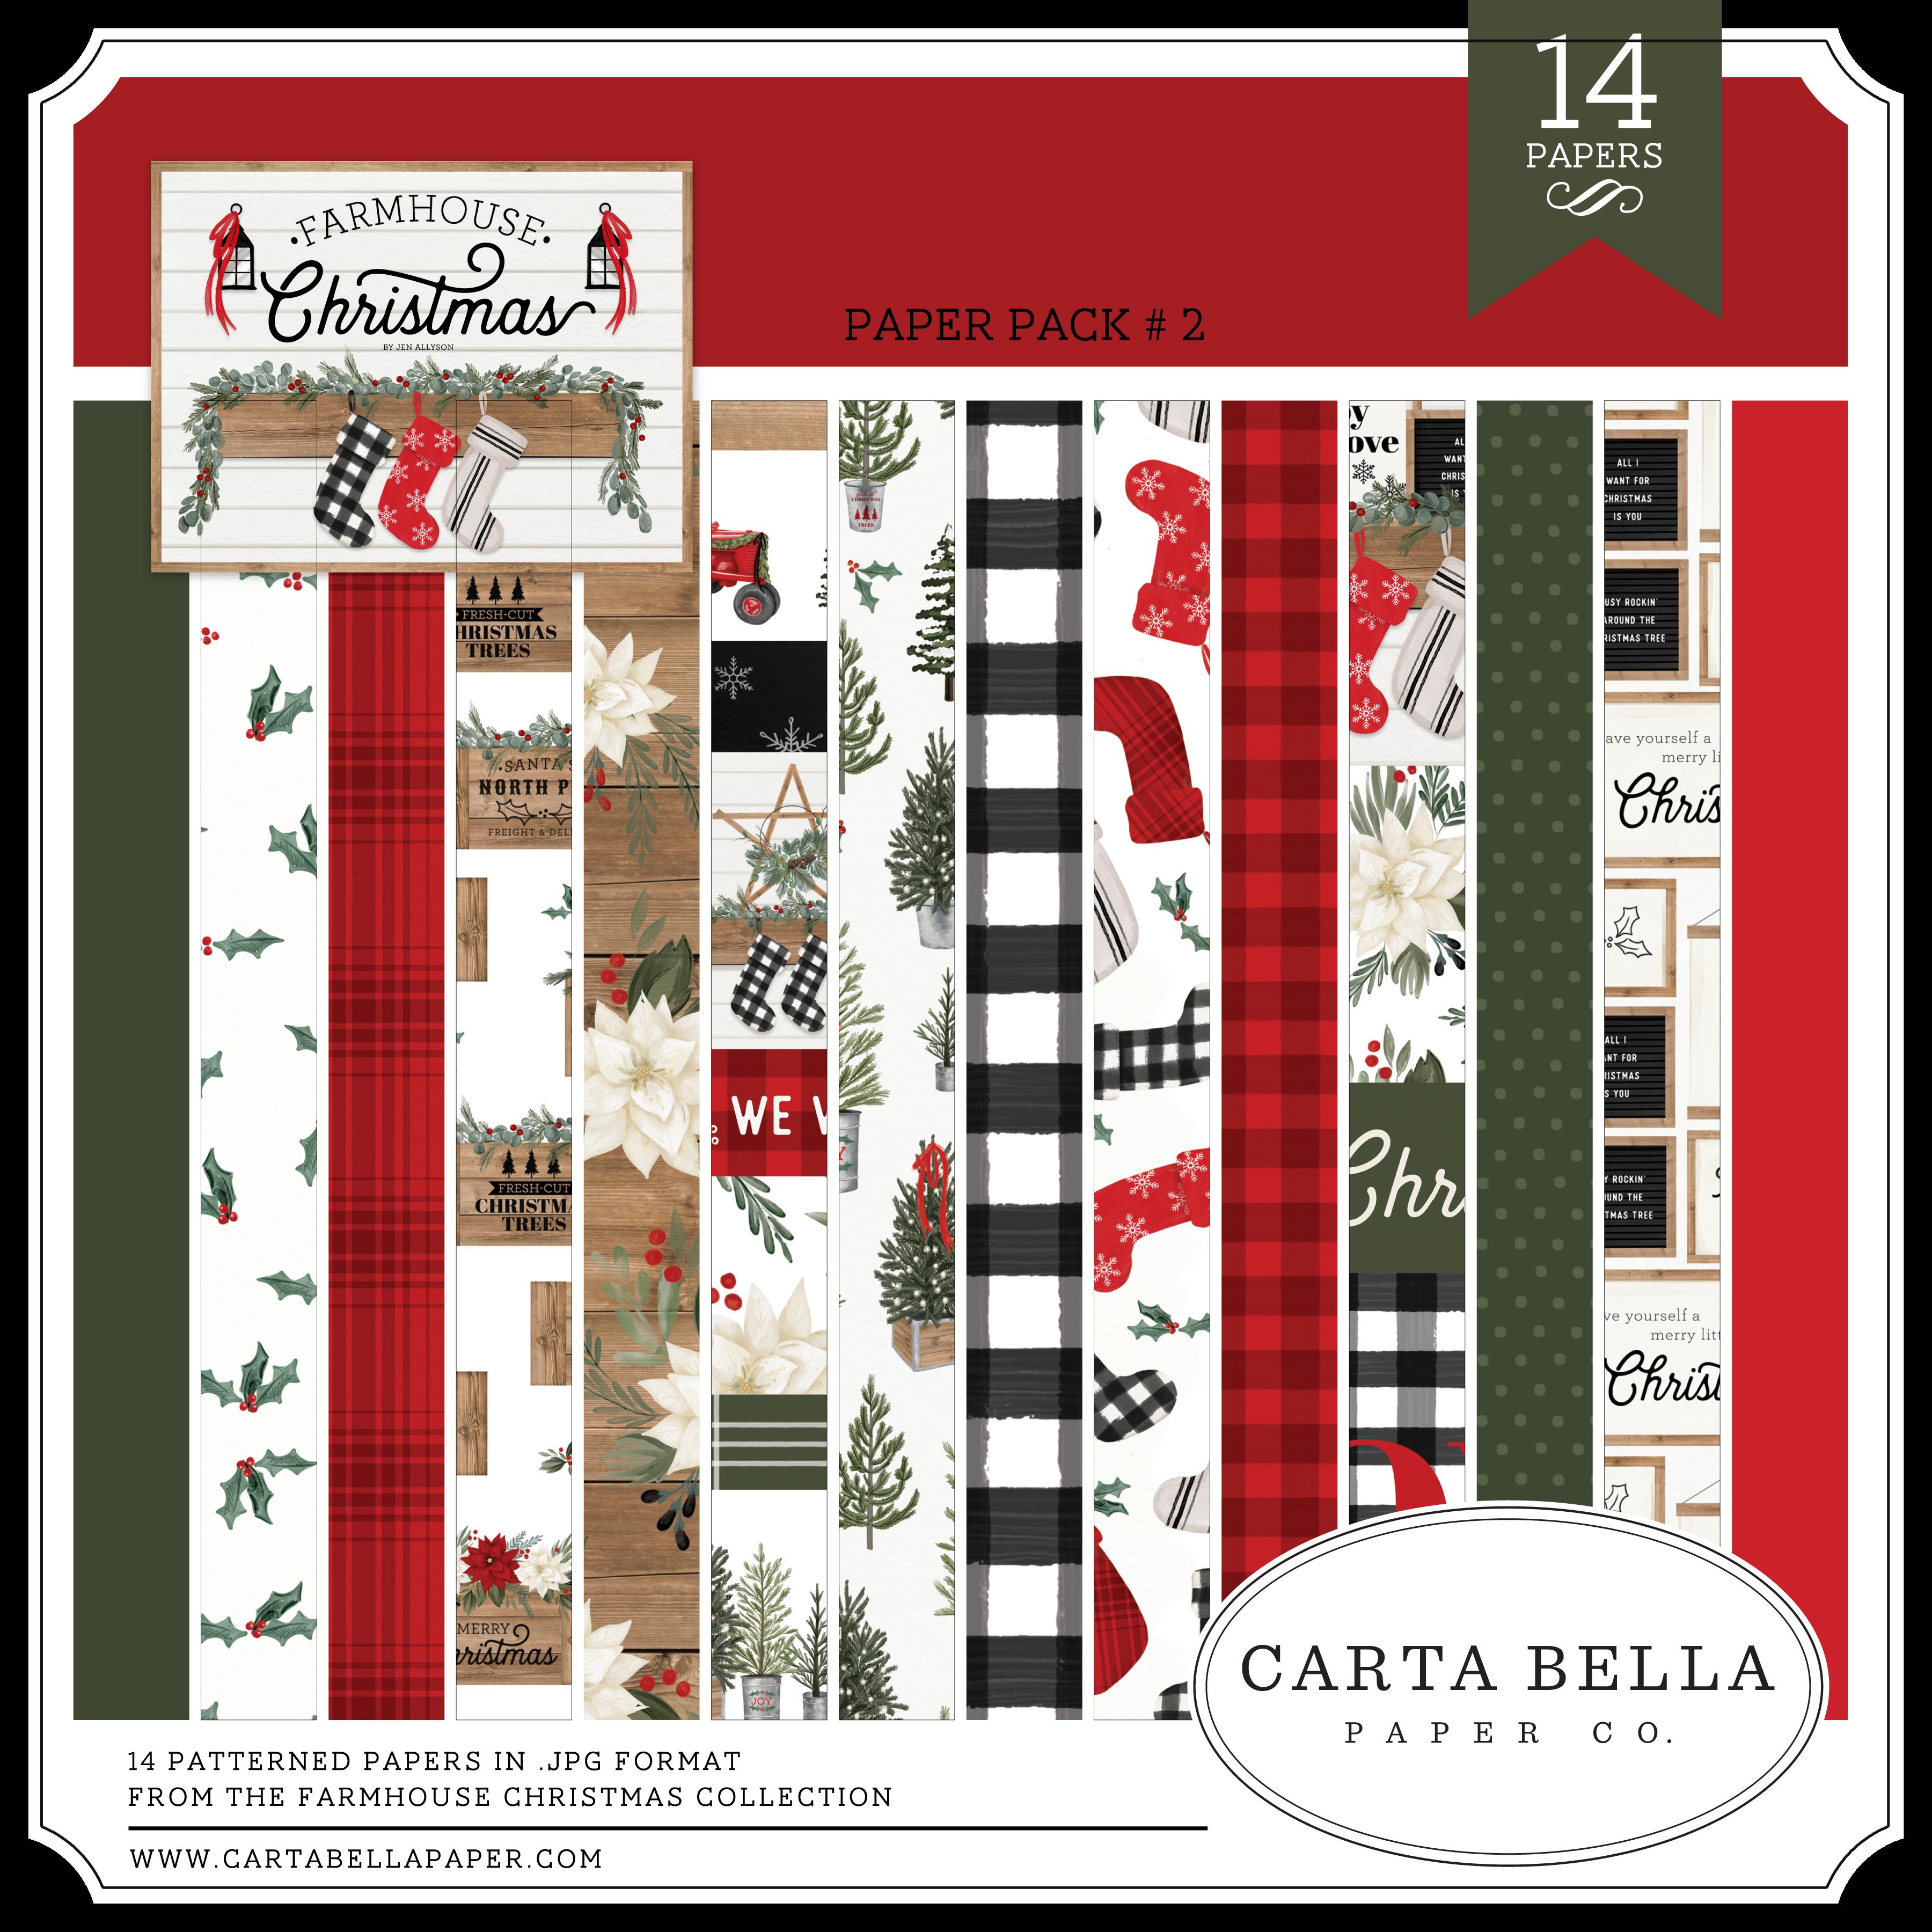 Farmhouse Christmas Paper Pack #2